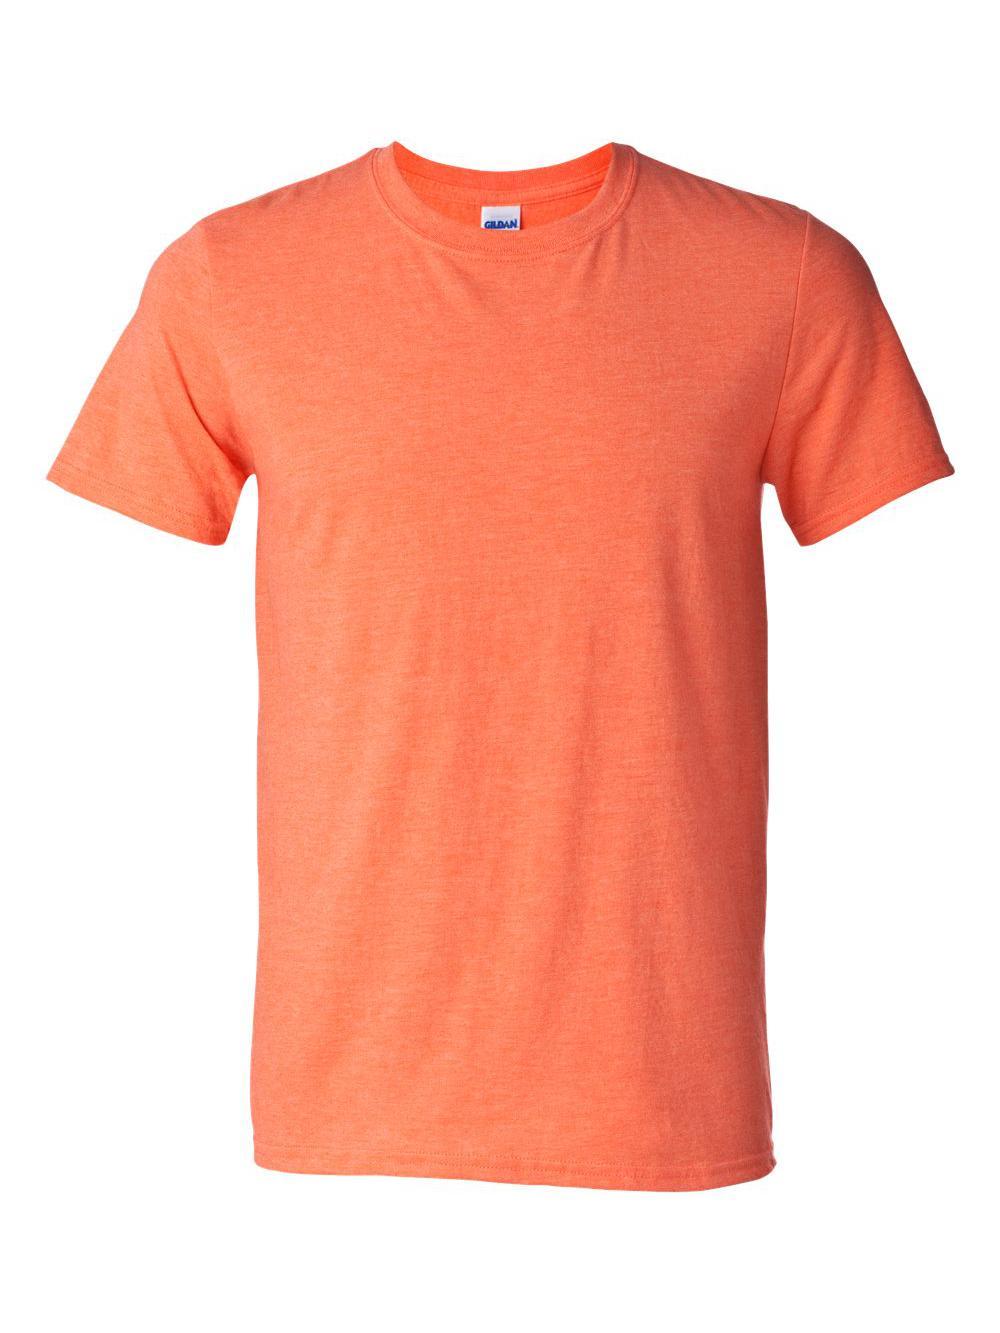 Gildan-Softstyle-T-Shirt-64000 thumbnail 87